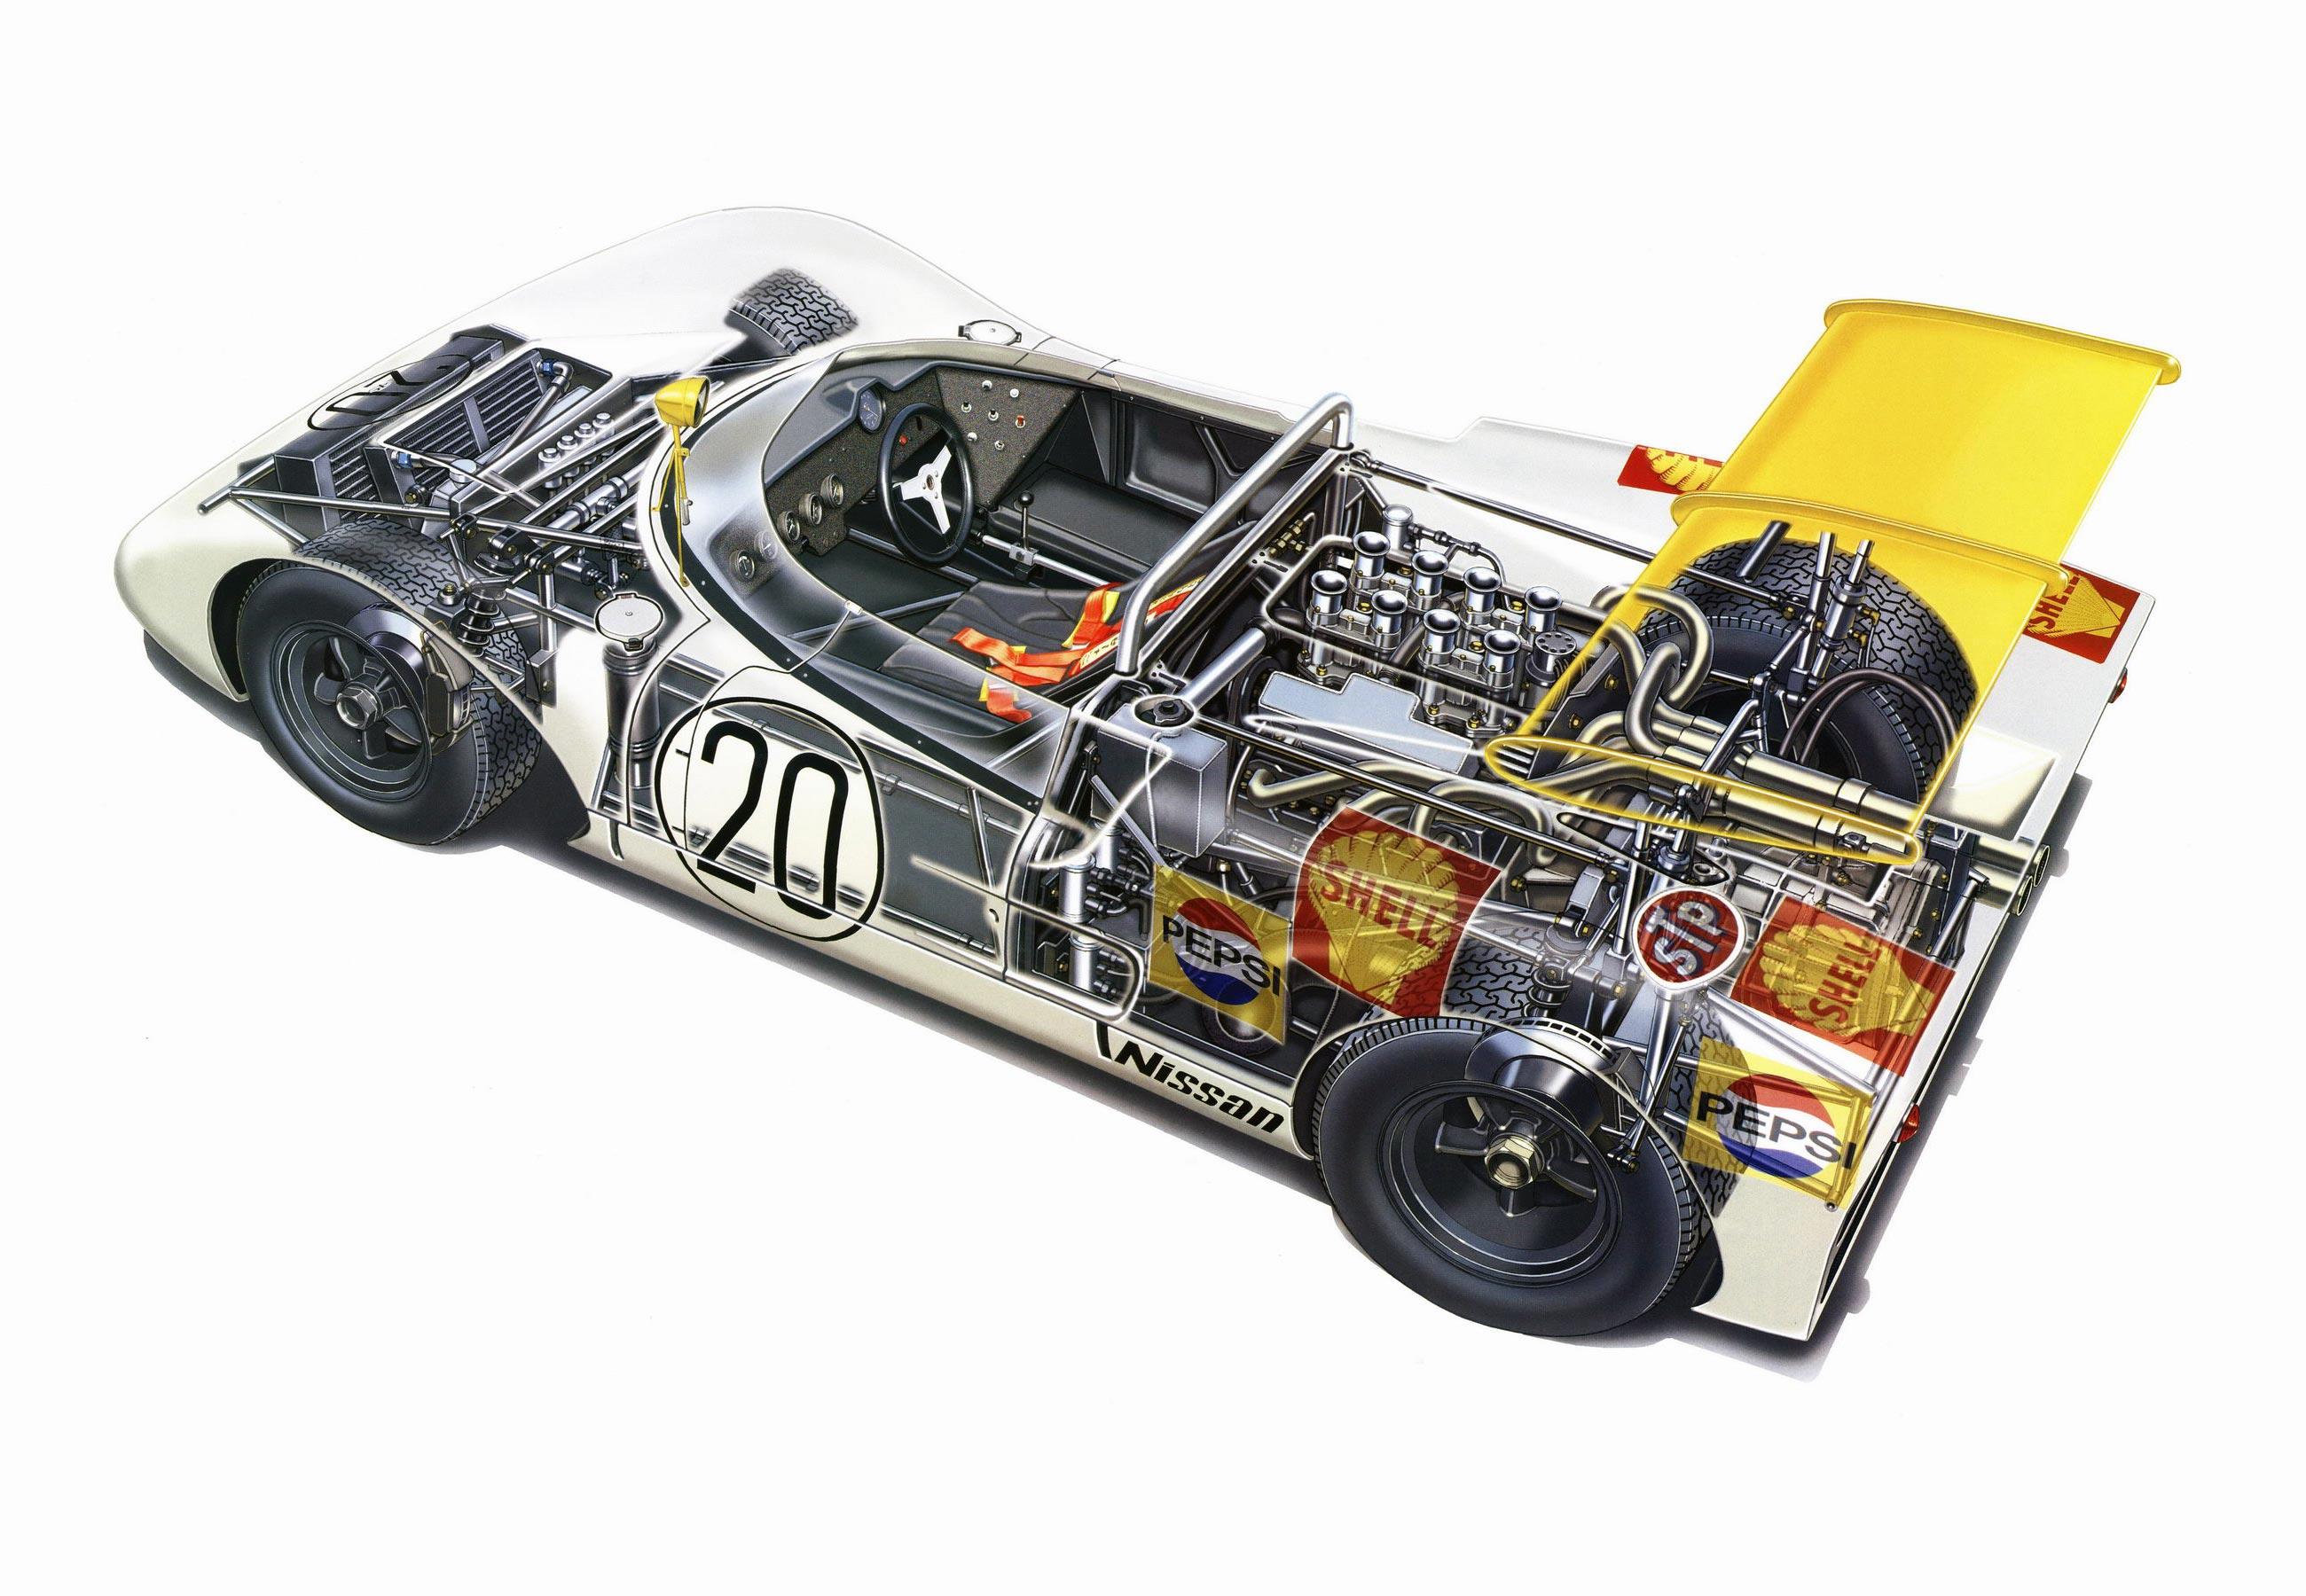 Nissan R381 cutaway drawing